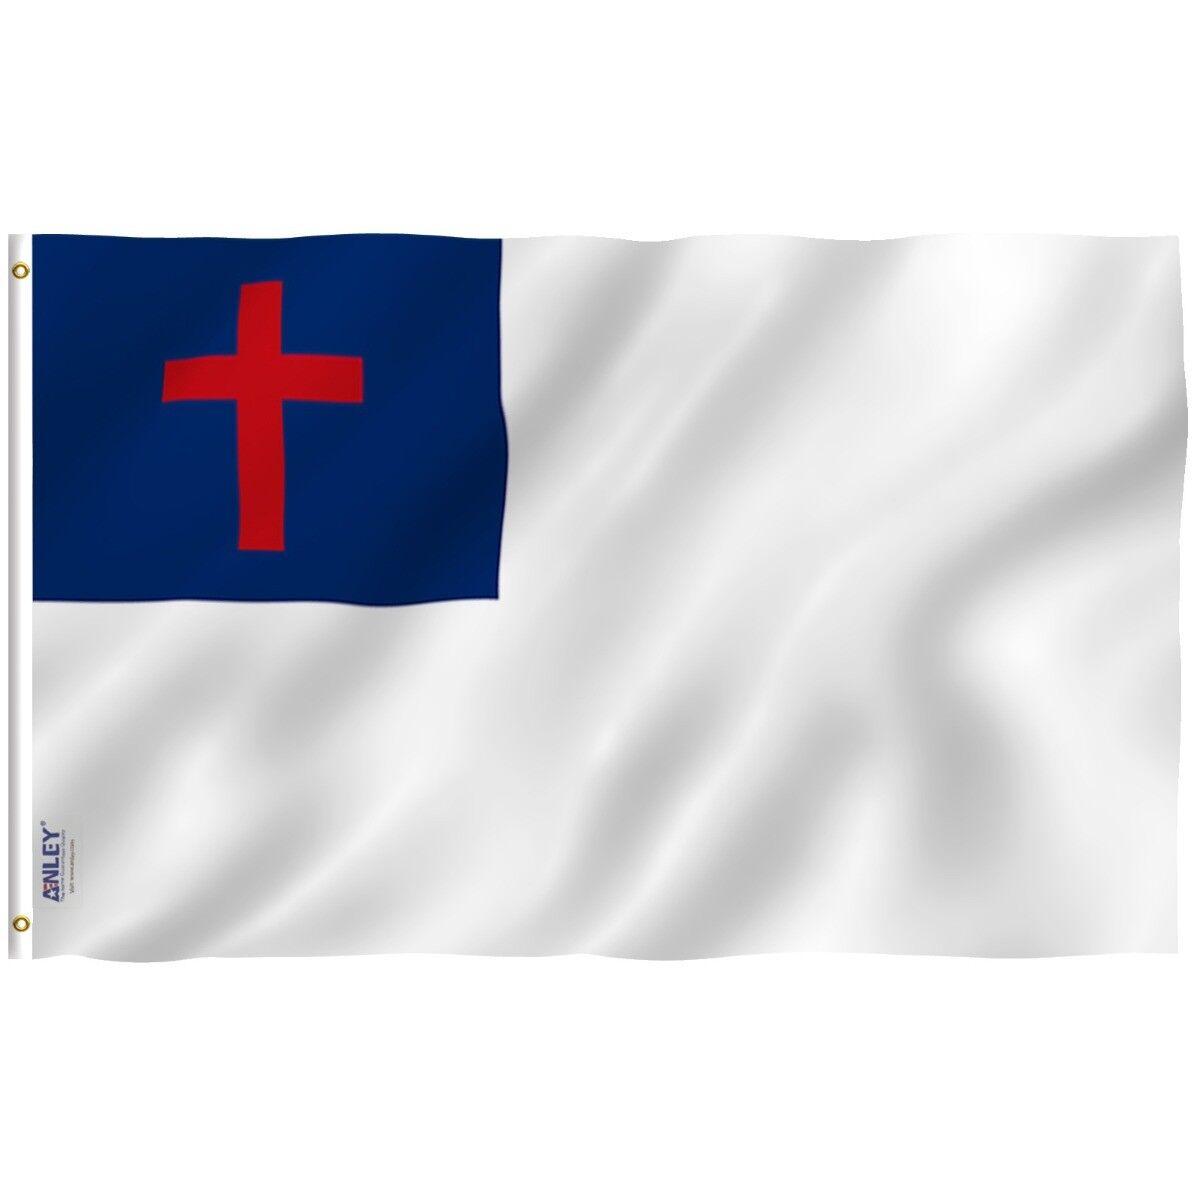 ANLEY Christian Church Flag Latin Cross Banner Polyester 3x5